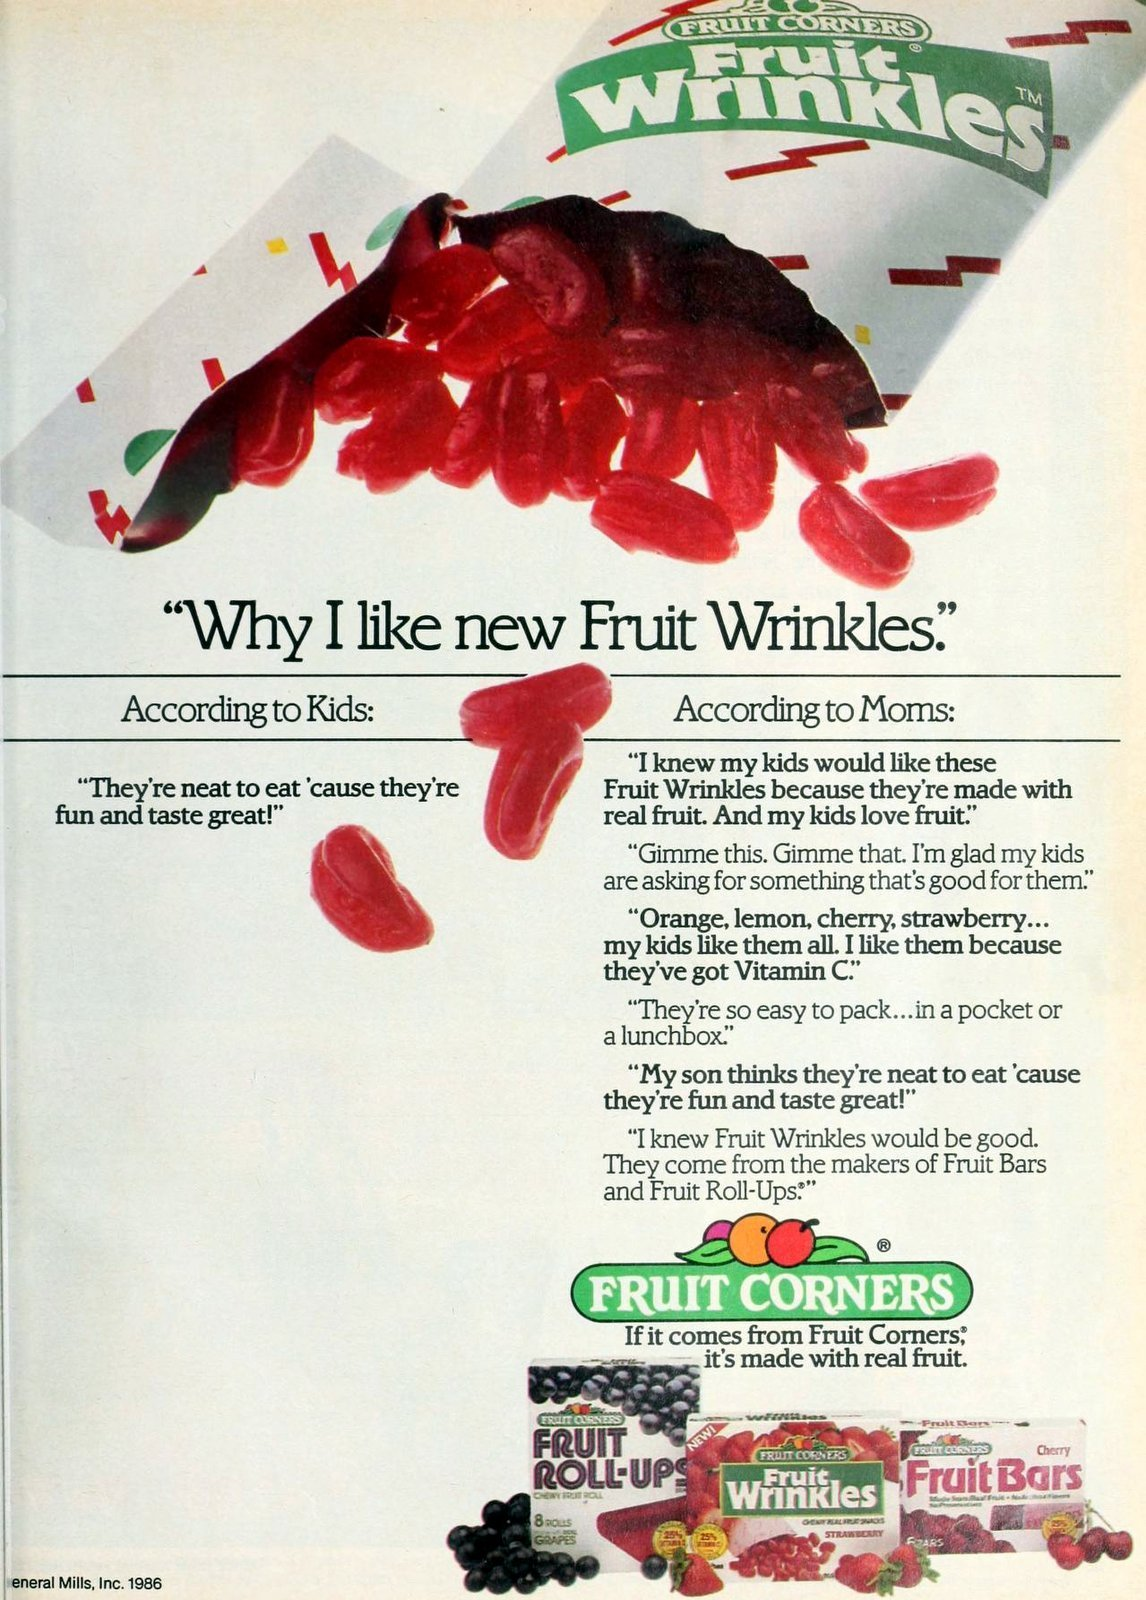 Retro 80s Fruit Wrinkles snack treat (1986)